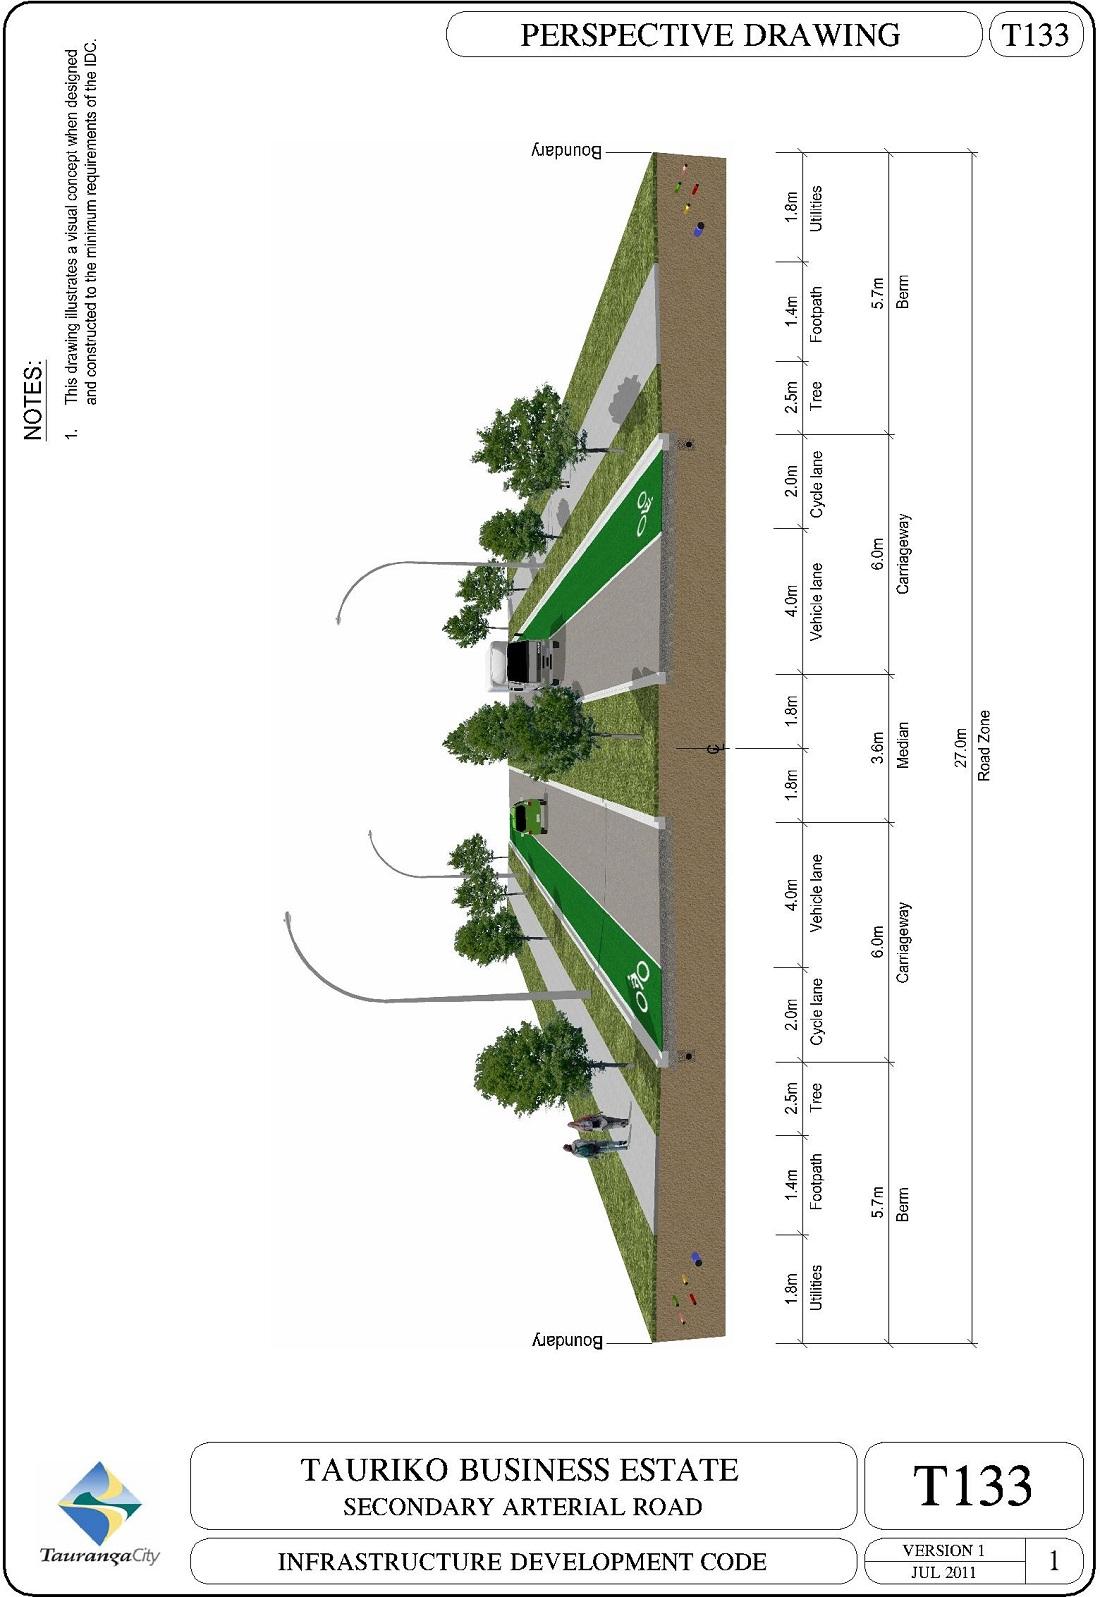 Tauriko Business Estate Secondary Arterial Road